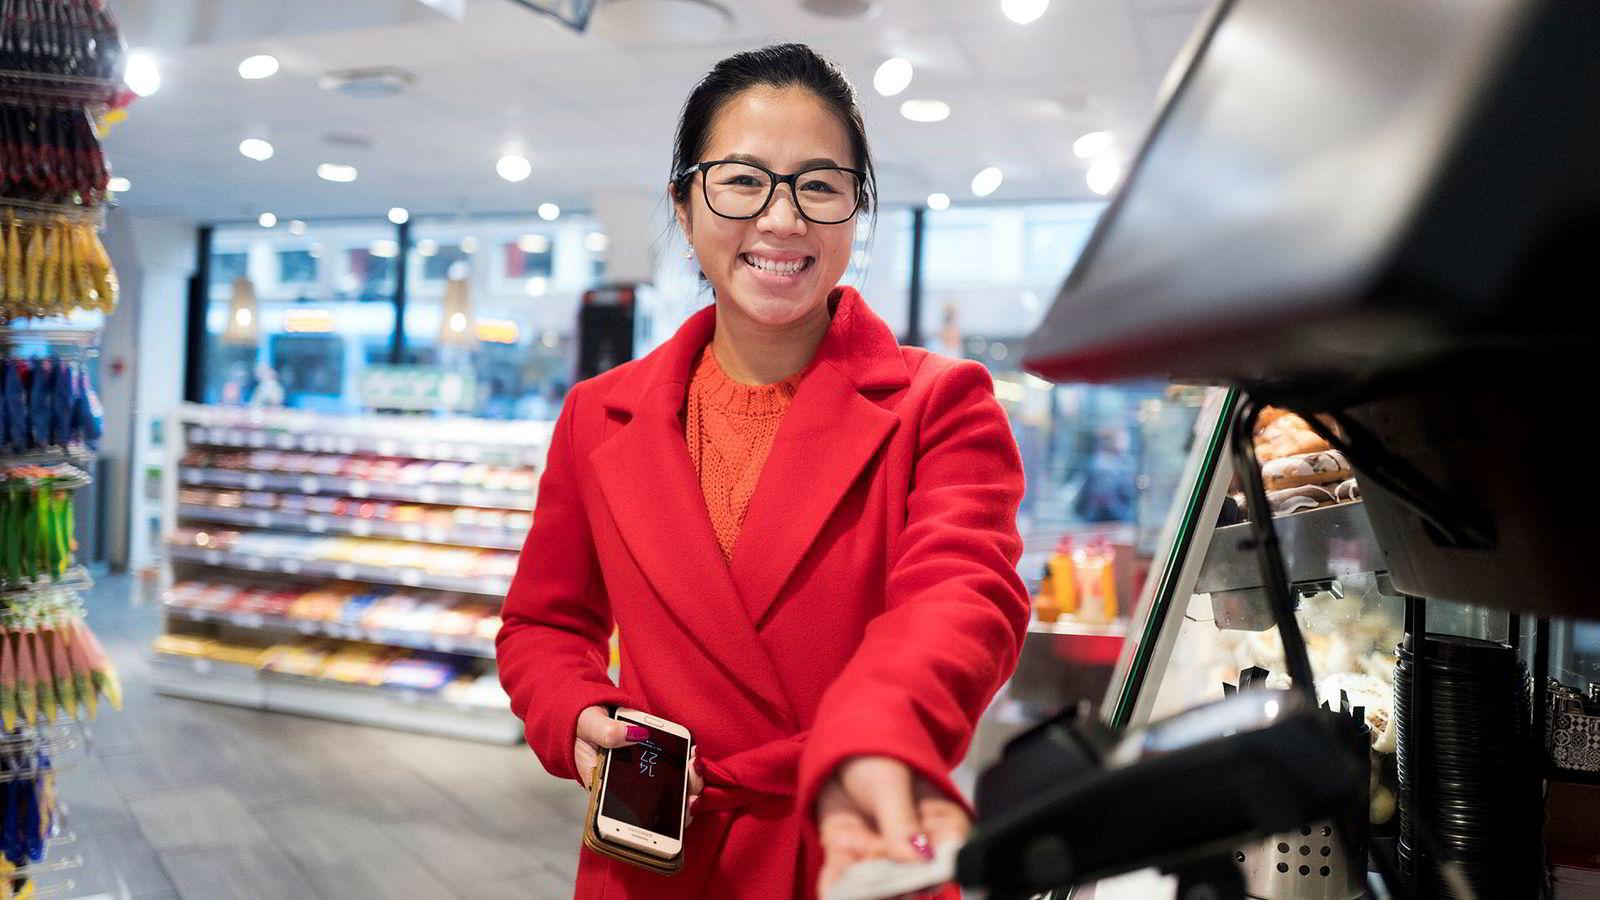 Anh Thi (27) betaler med bankkort på 7-eleven ved Gunerius-senteret i Oslo, til tross for at hun har smarttelefon som har mulighet for kontaktløs betaling. Apple Pay har vært på markedet siden Juni. Google Pay kom sist uke.